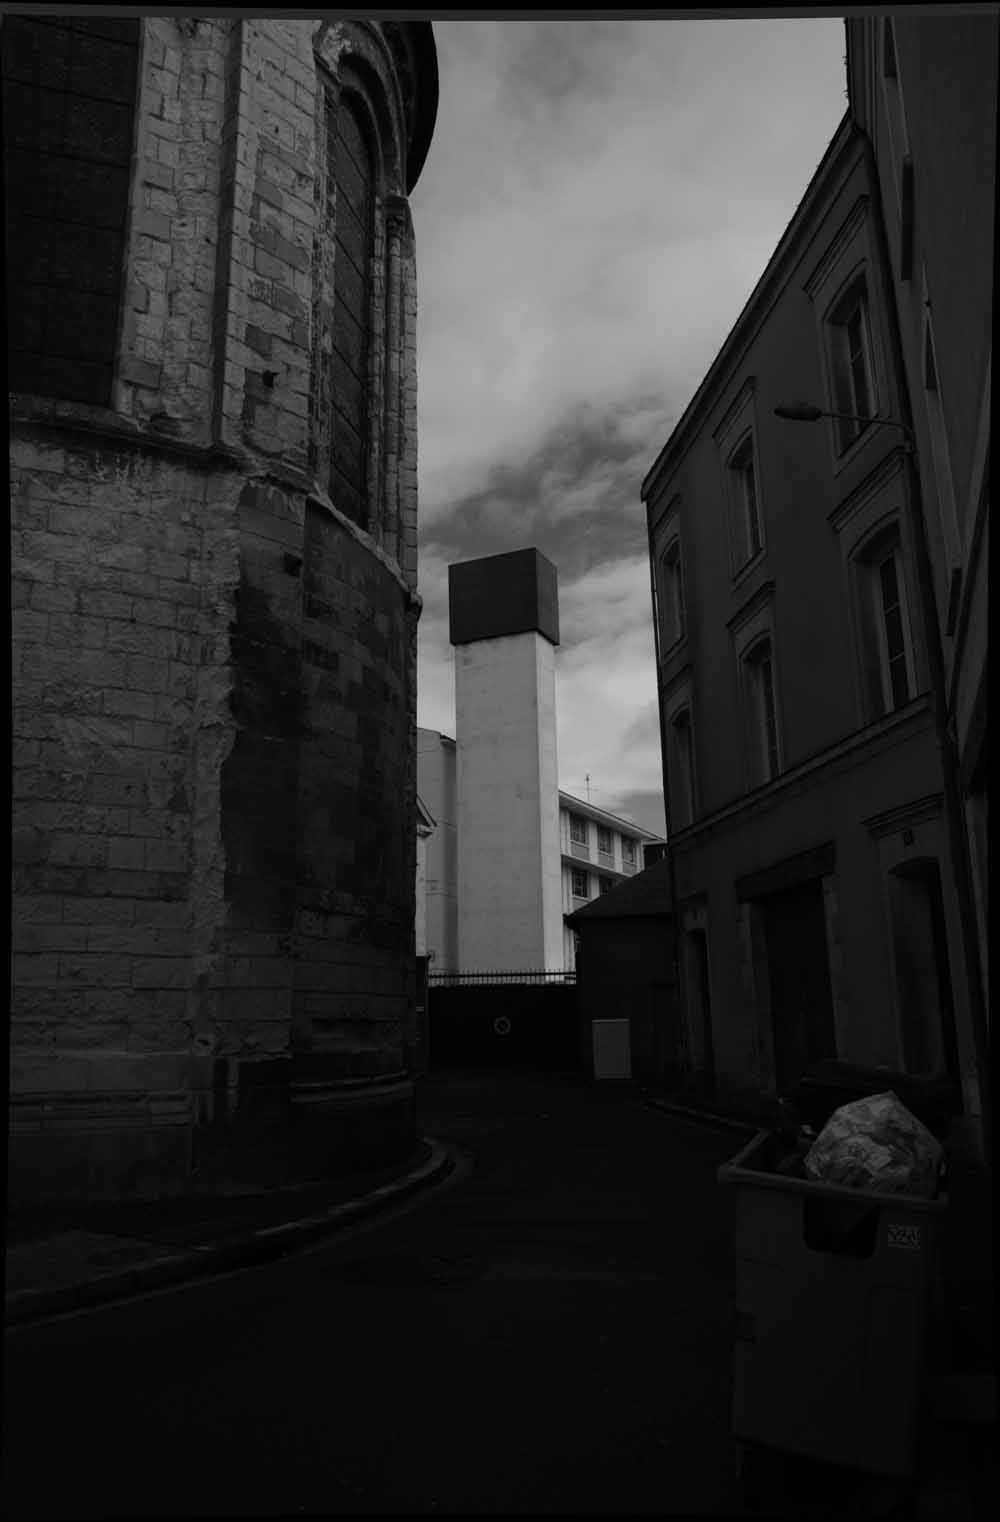 regard-fugace-03